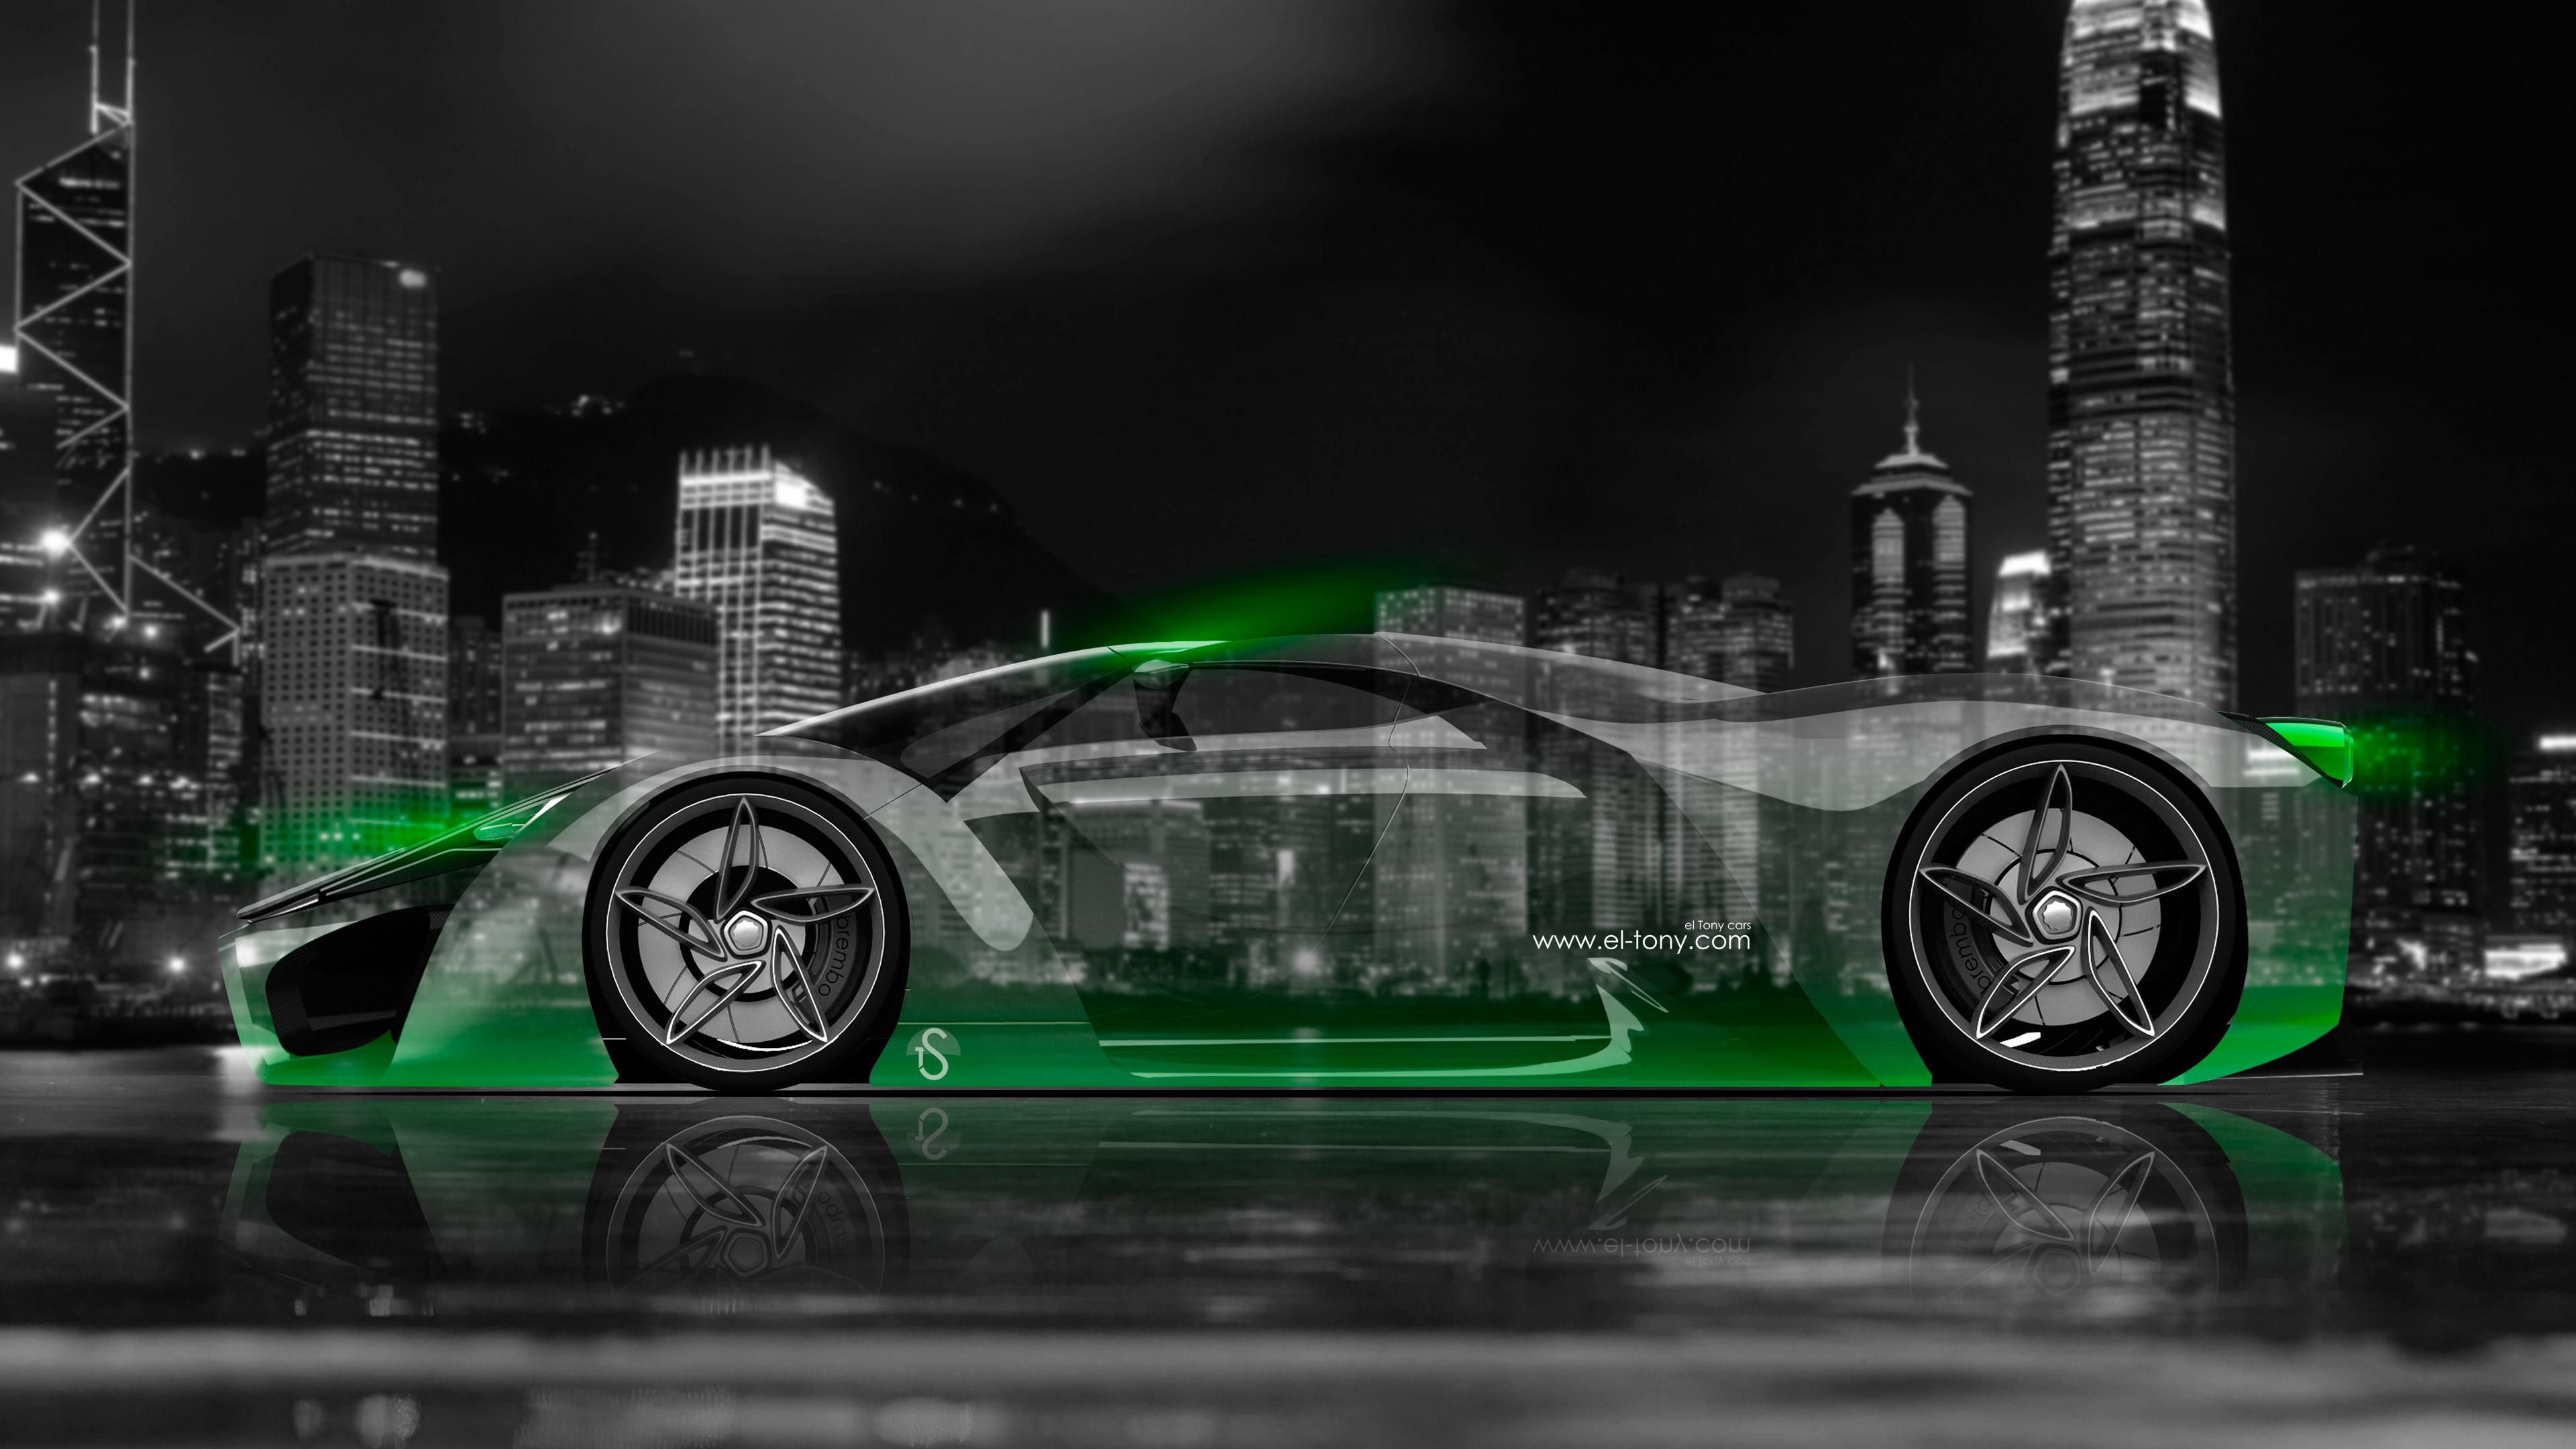 Ferrari F80 Side Crystal City Car 2014 Green Neon 4K Wallpapers design 3840x2160